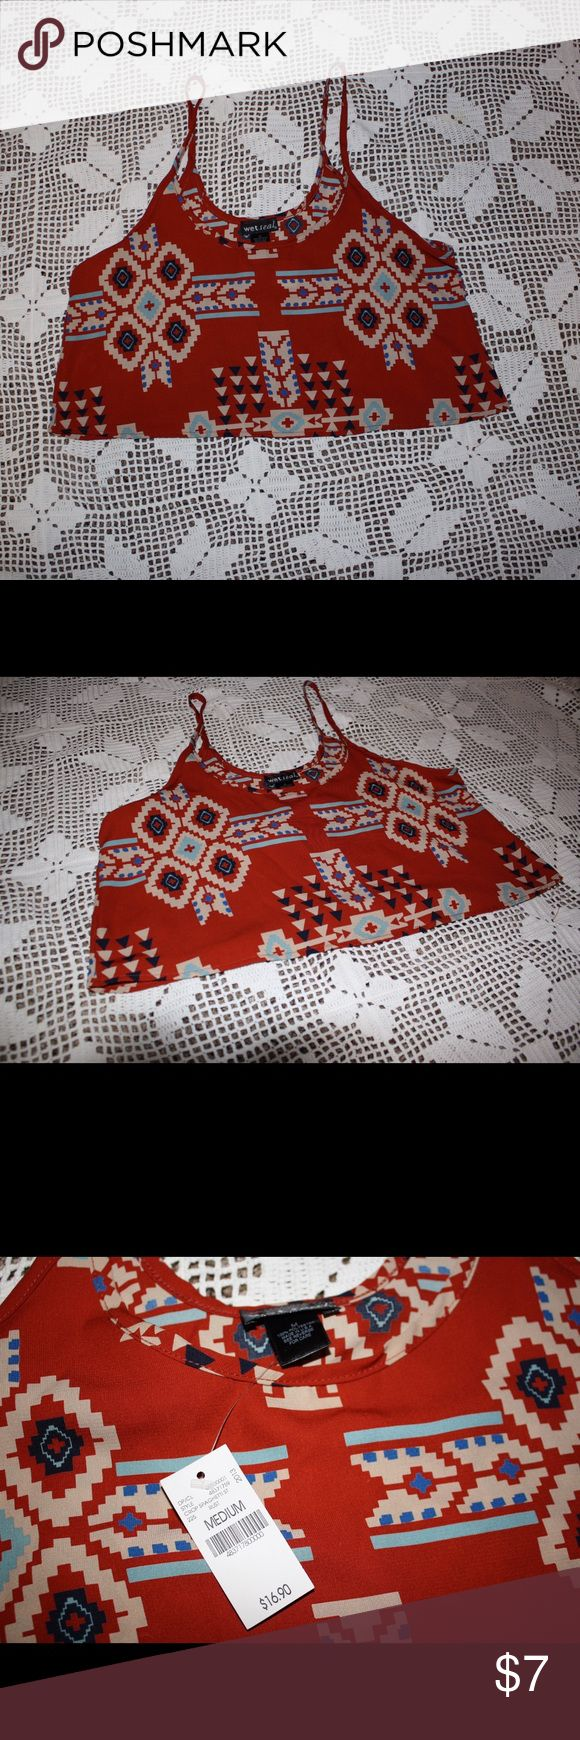 Aztec Crop Top Aztec crop top! Cute with high waisted shorts! Never worn Tops Crop Tops